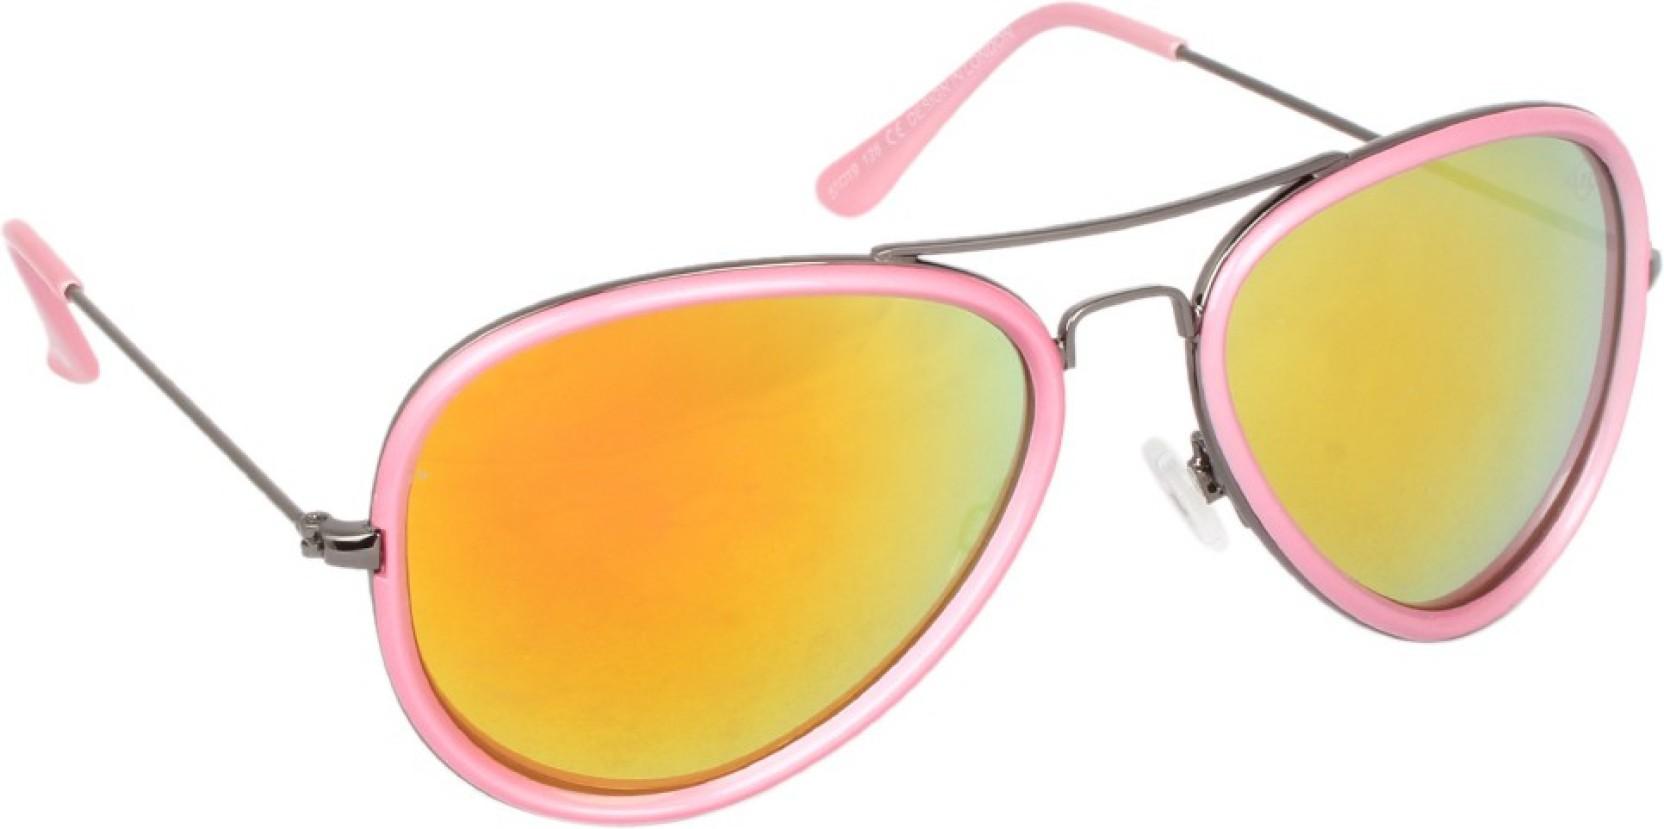 994dae0ade Buy Lee Cooper Aviator Sunglasses Pink For Men   Women Online   Best ...